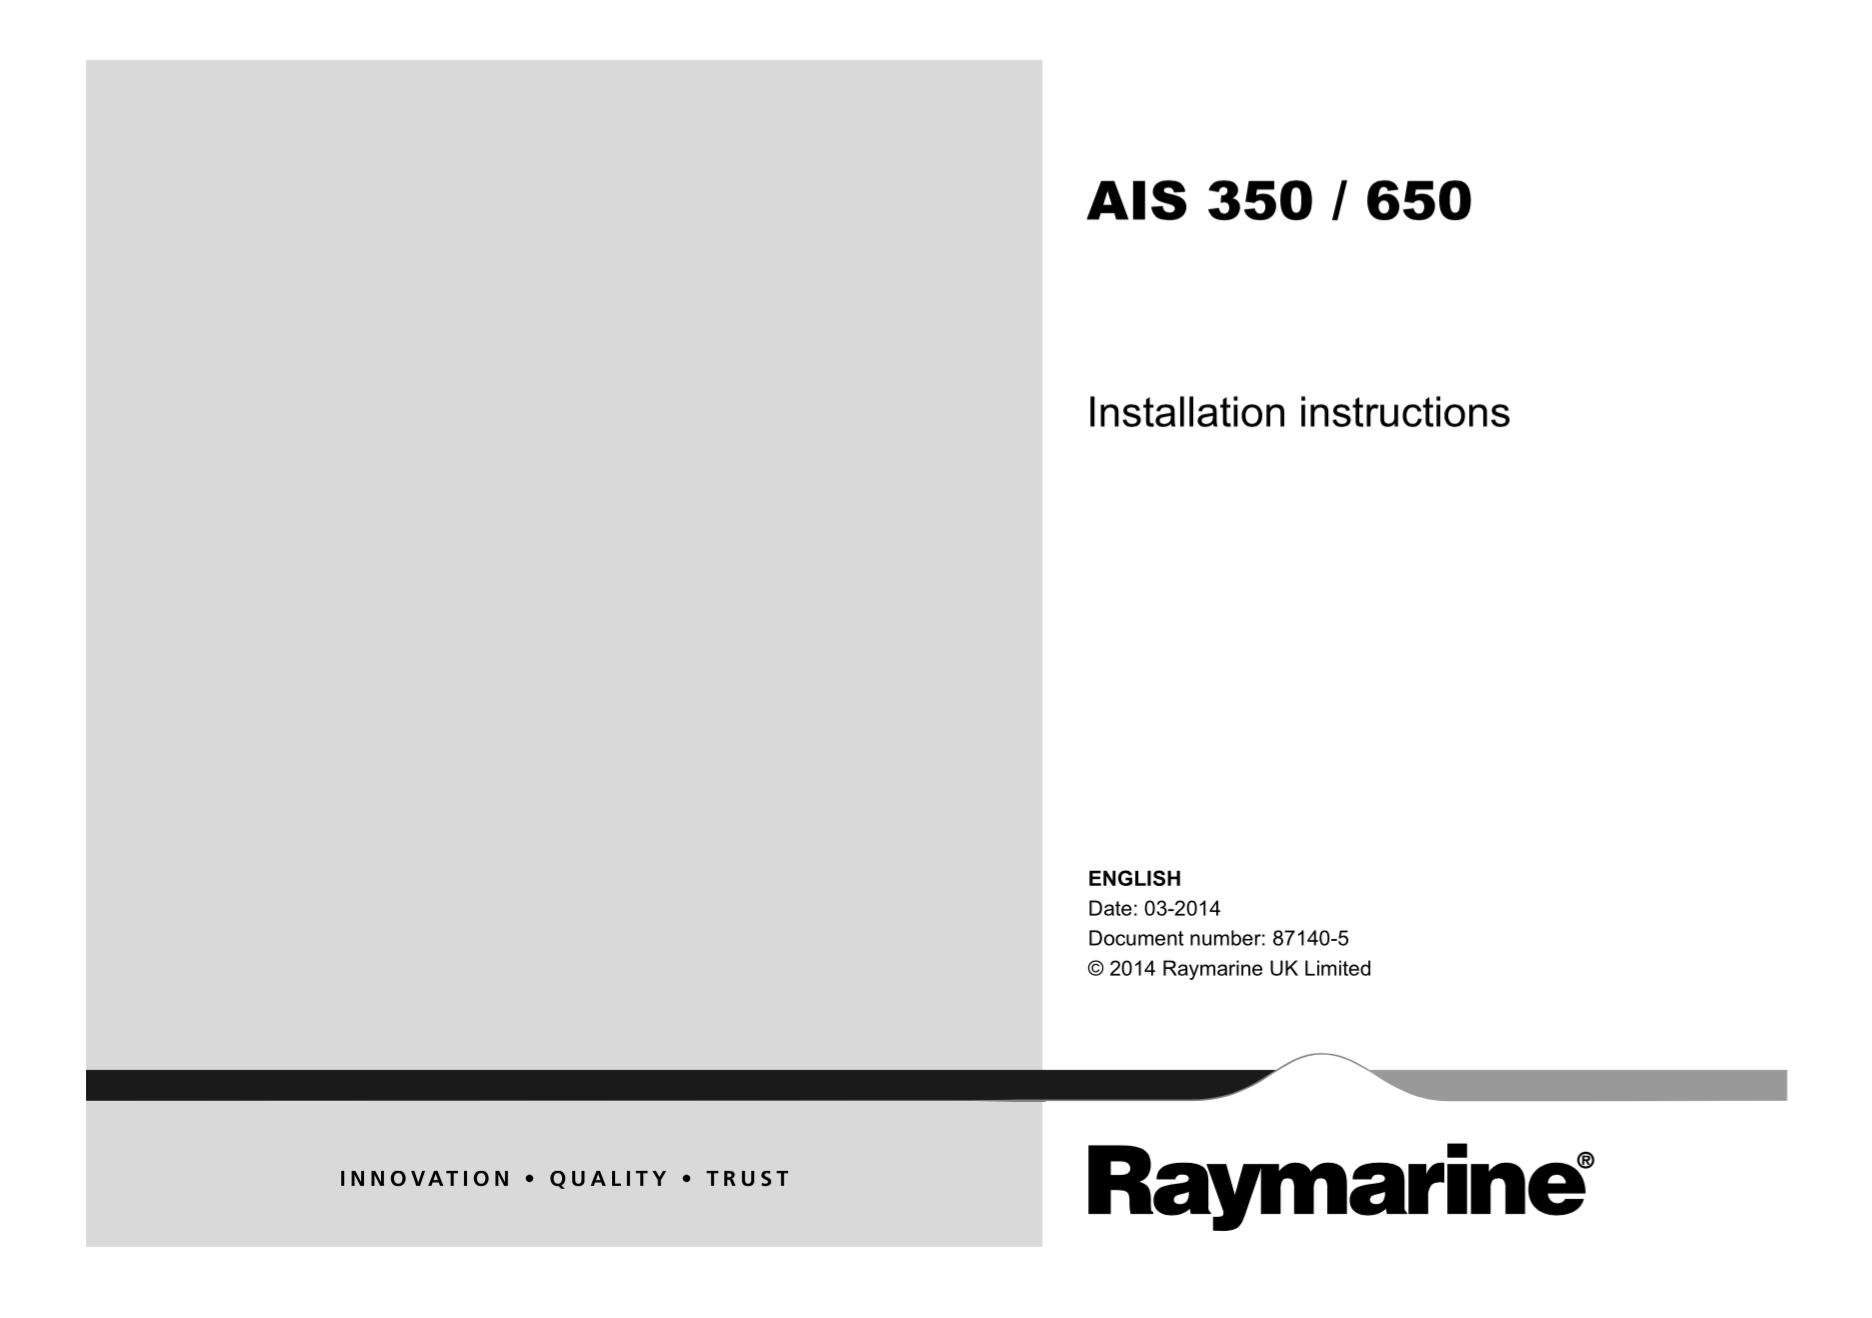 ais 350 650 installation instructions